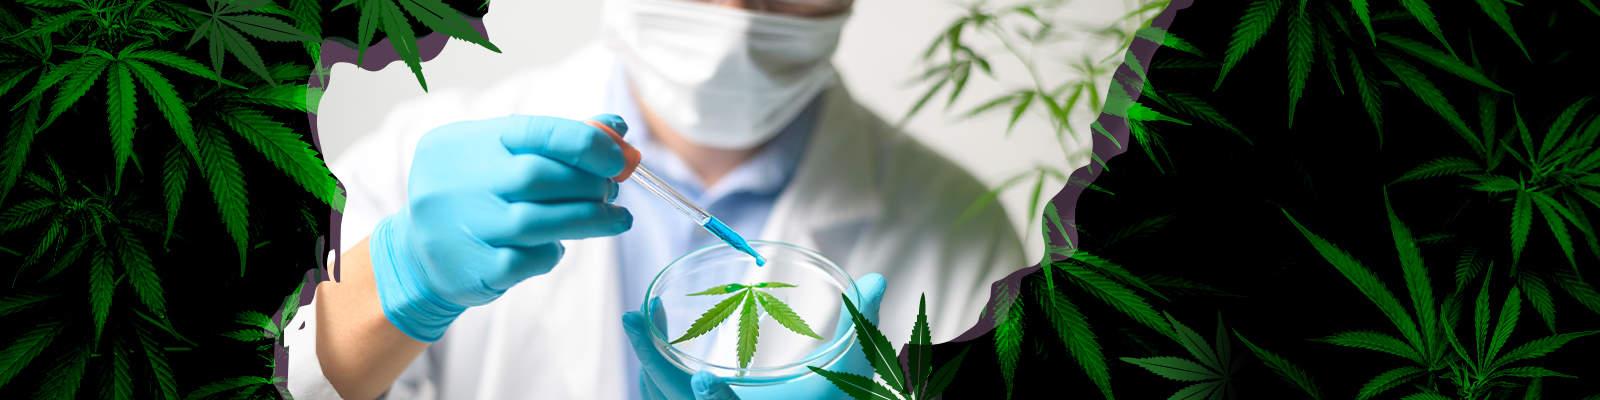 Highest Earning Cannabis Careers